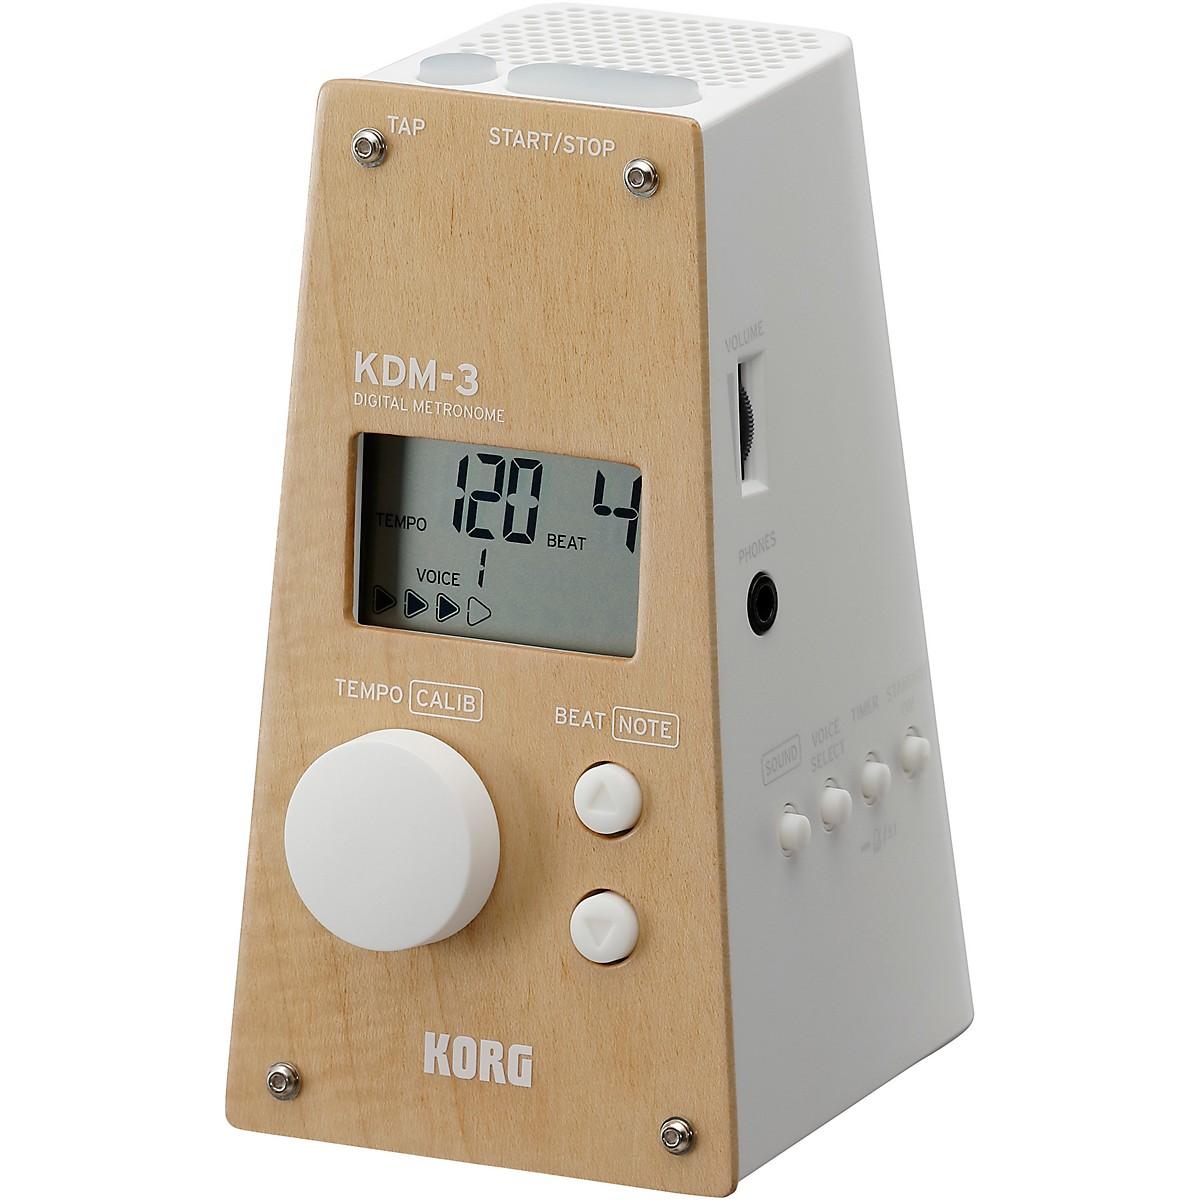 Korg Limited Edition KDM-3 Digital Metronome